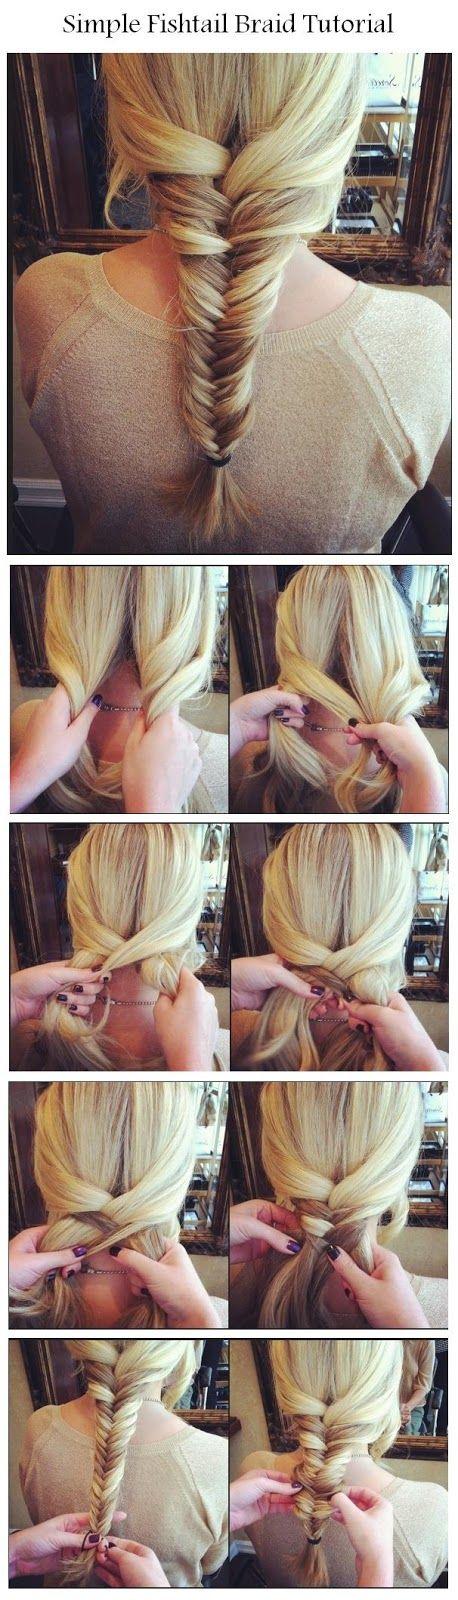 Simple Fishtail Braid | hairstyles tutorial